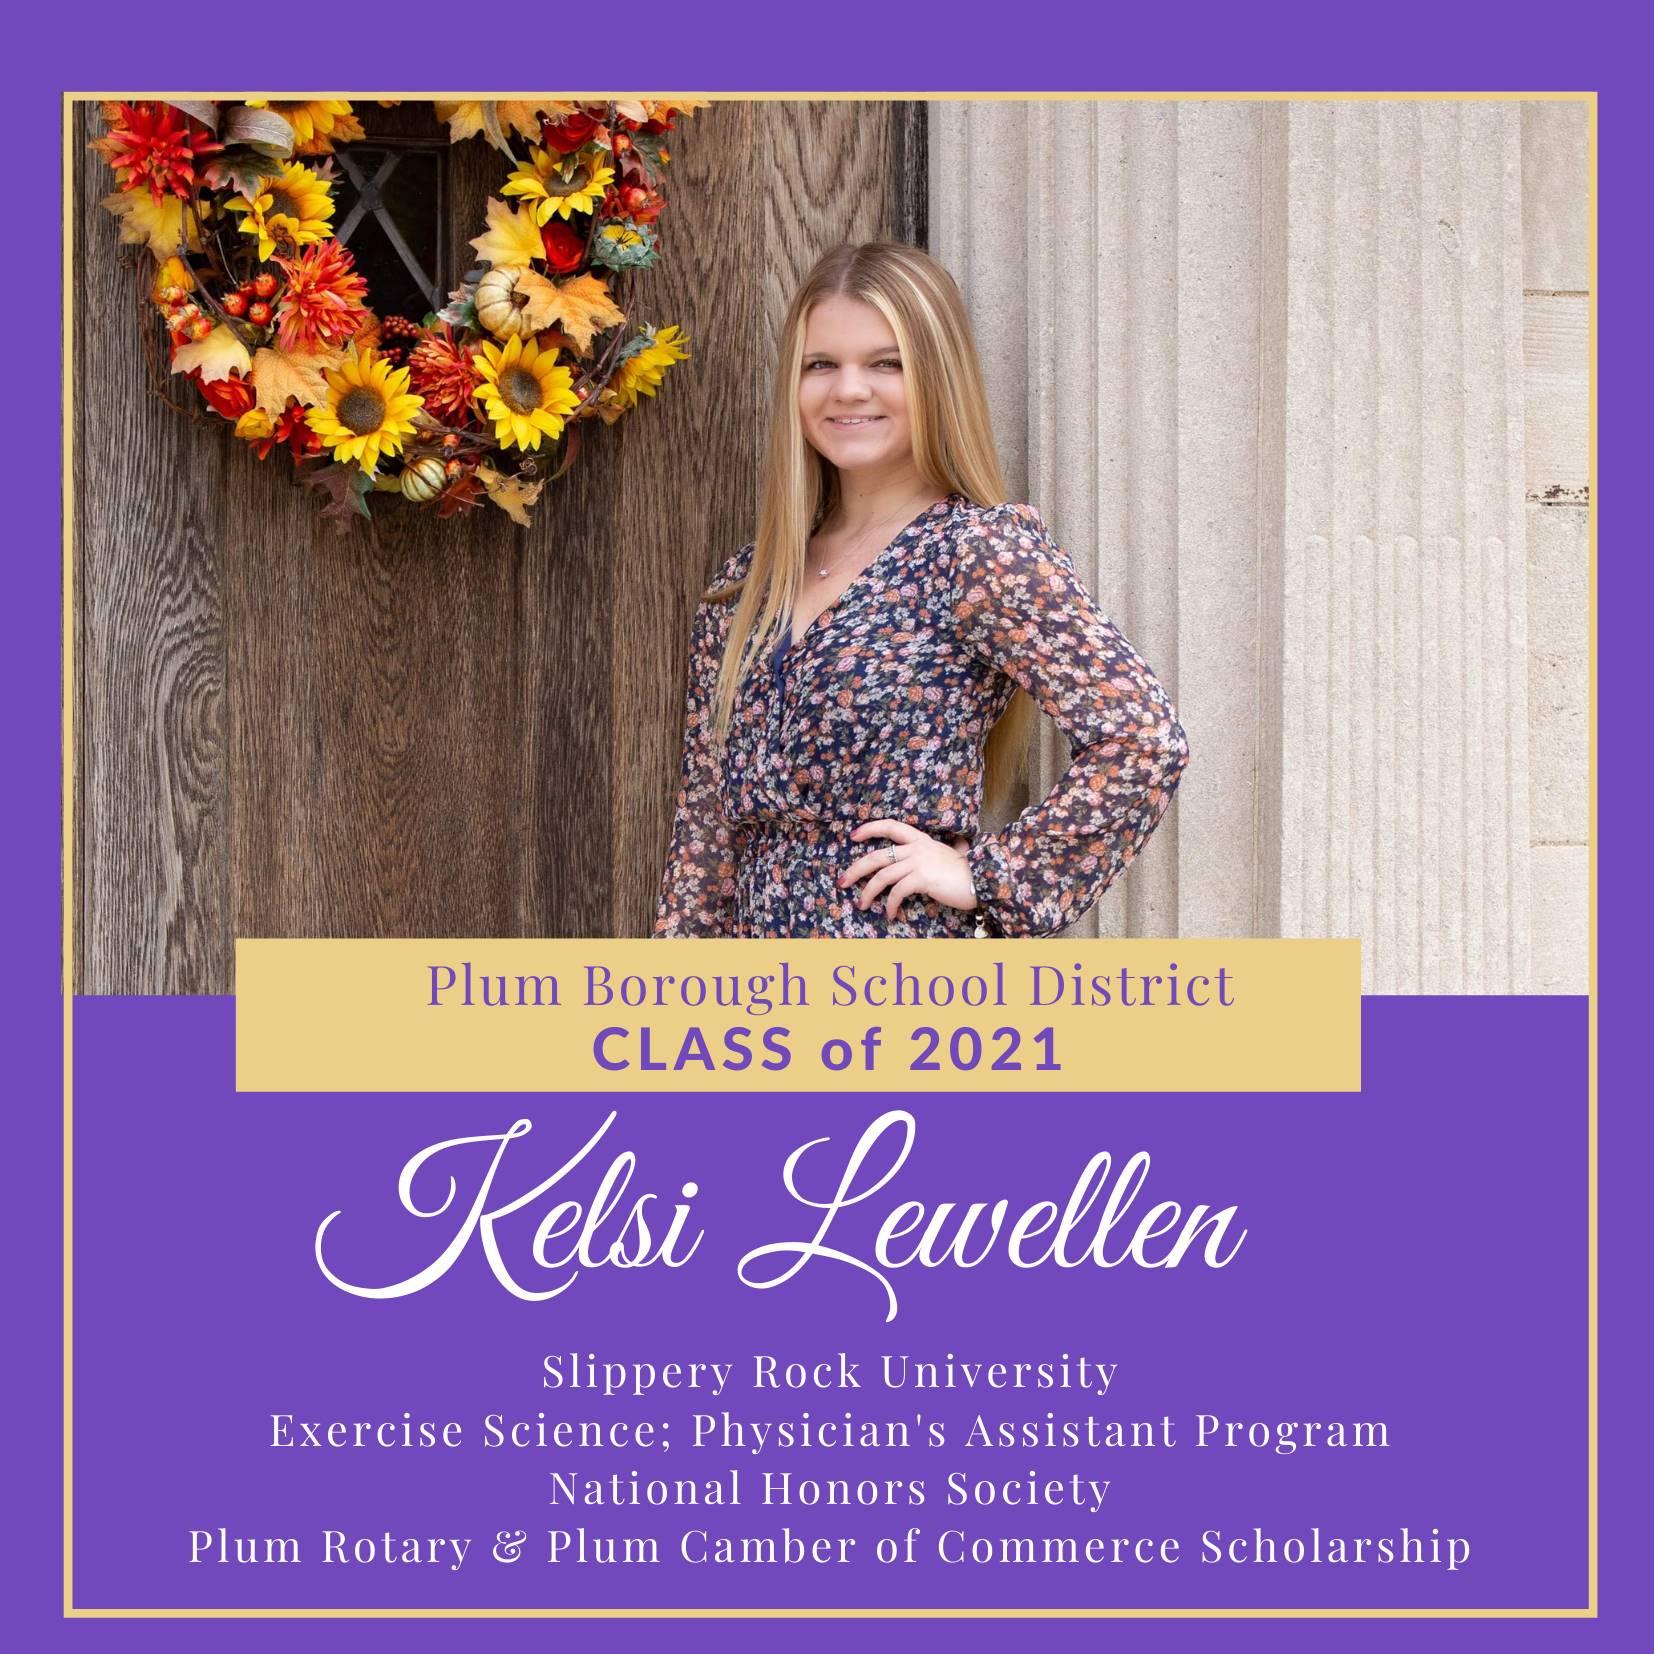 Congratulations to Kelsi Lewellen, Class of 2021!